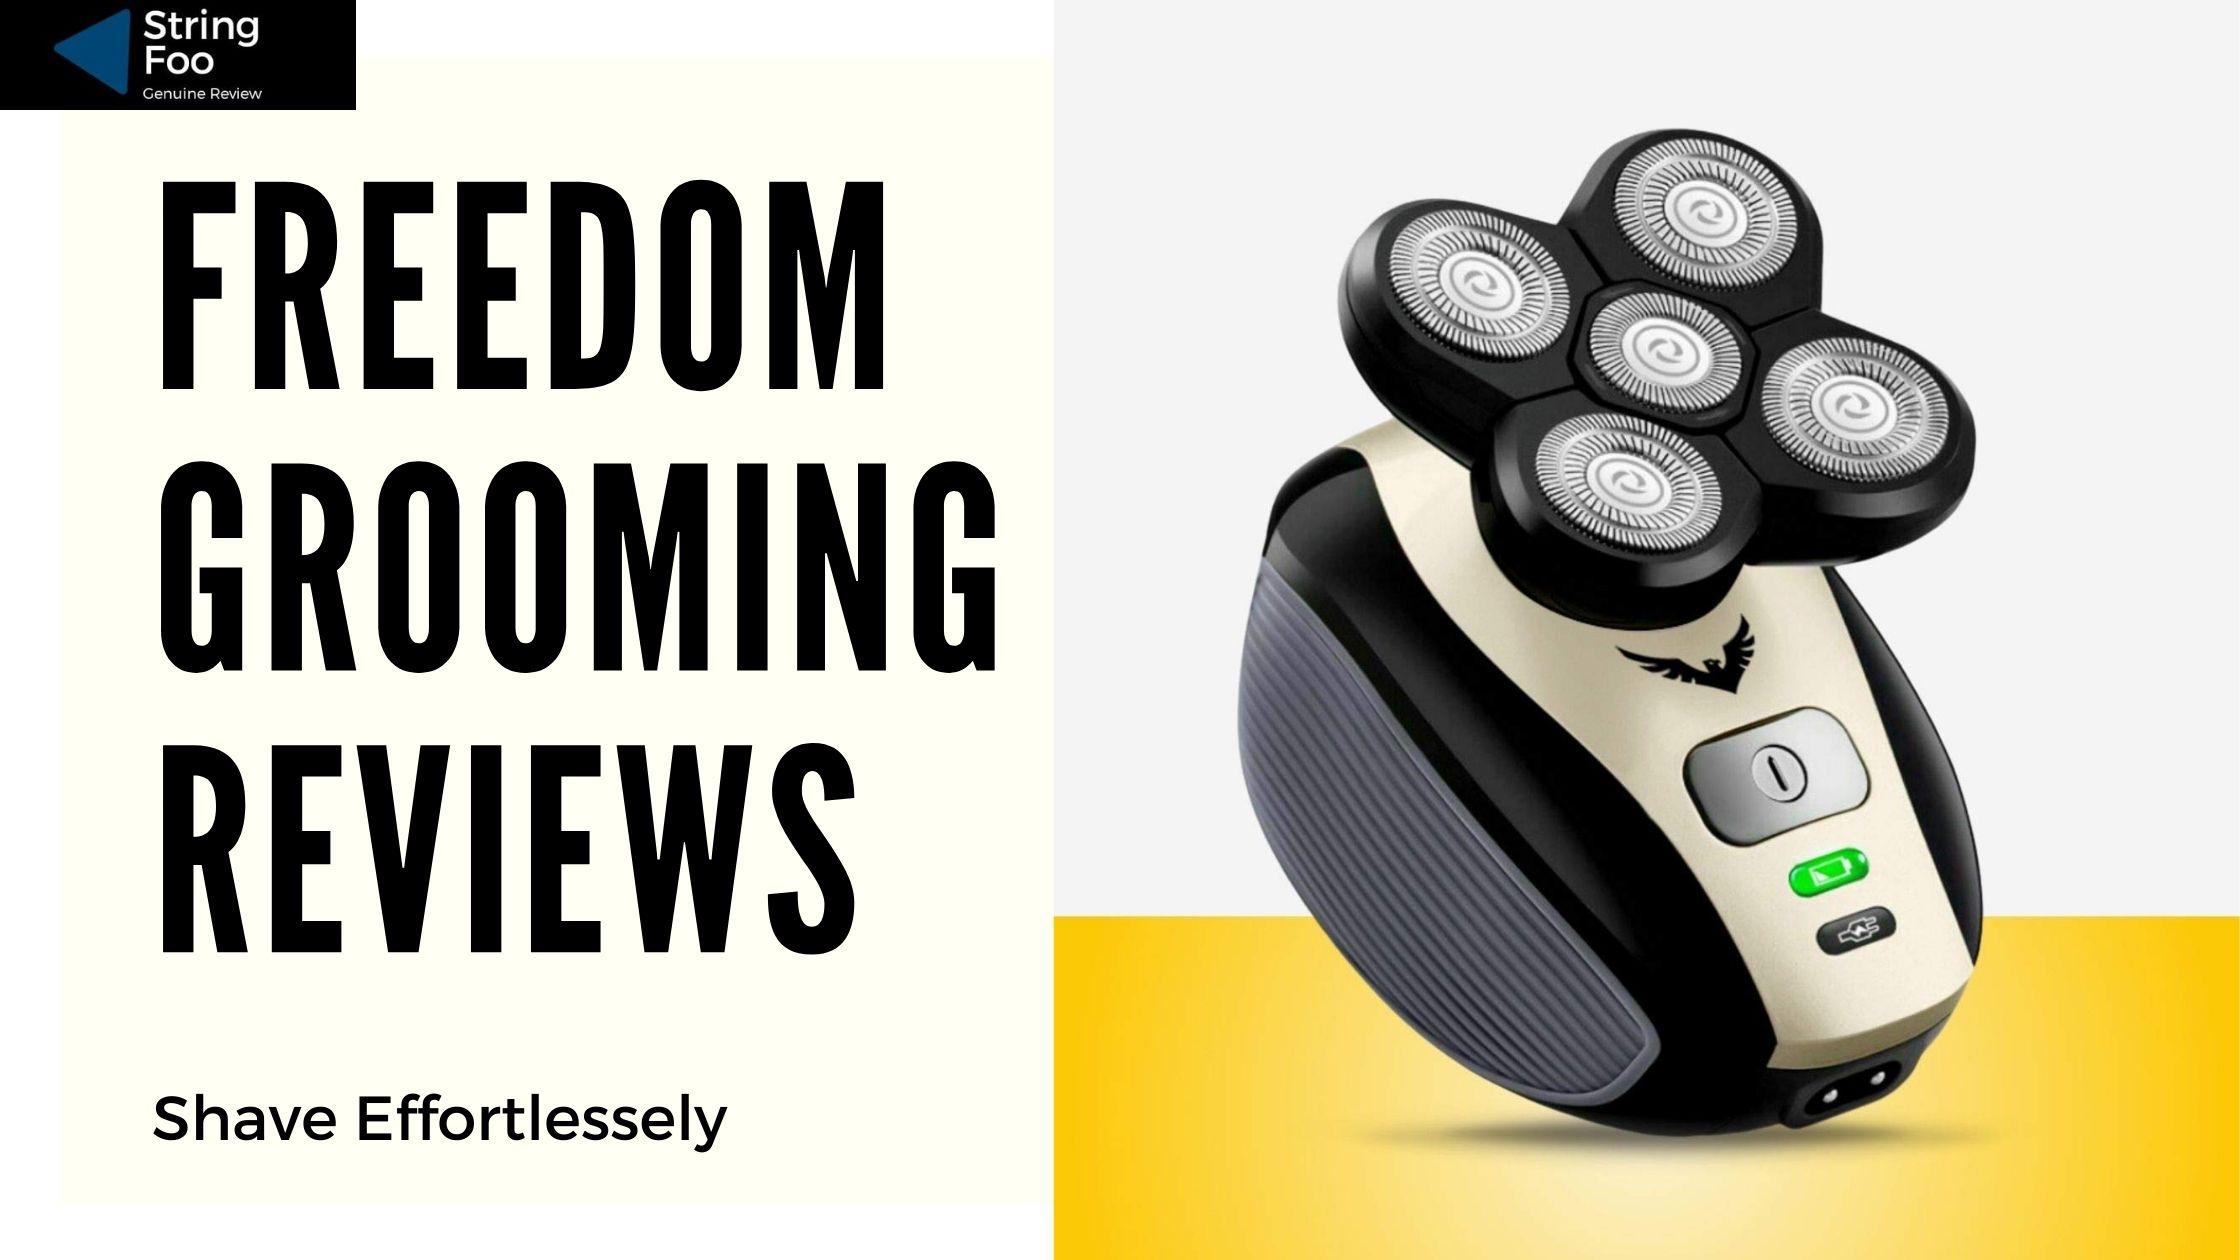 Freedom Grooming Reviews